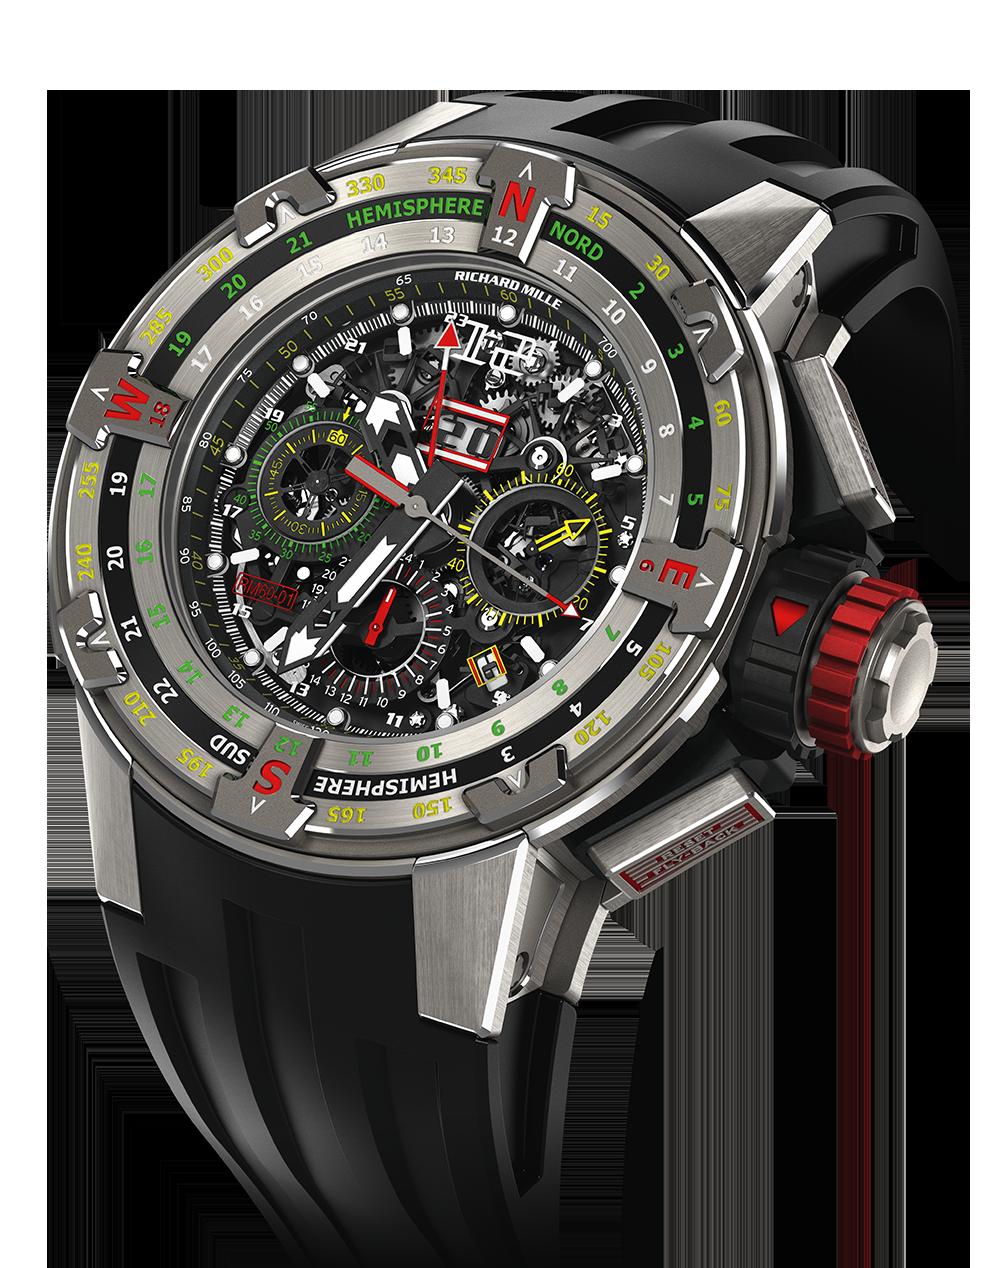 RM 60-01-Regatta Flyback Chronograph